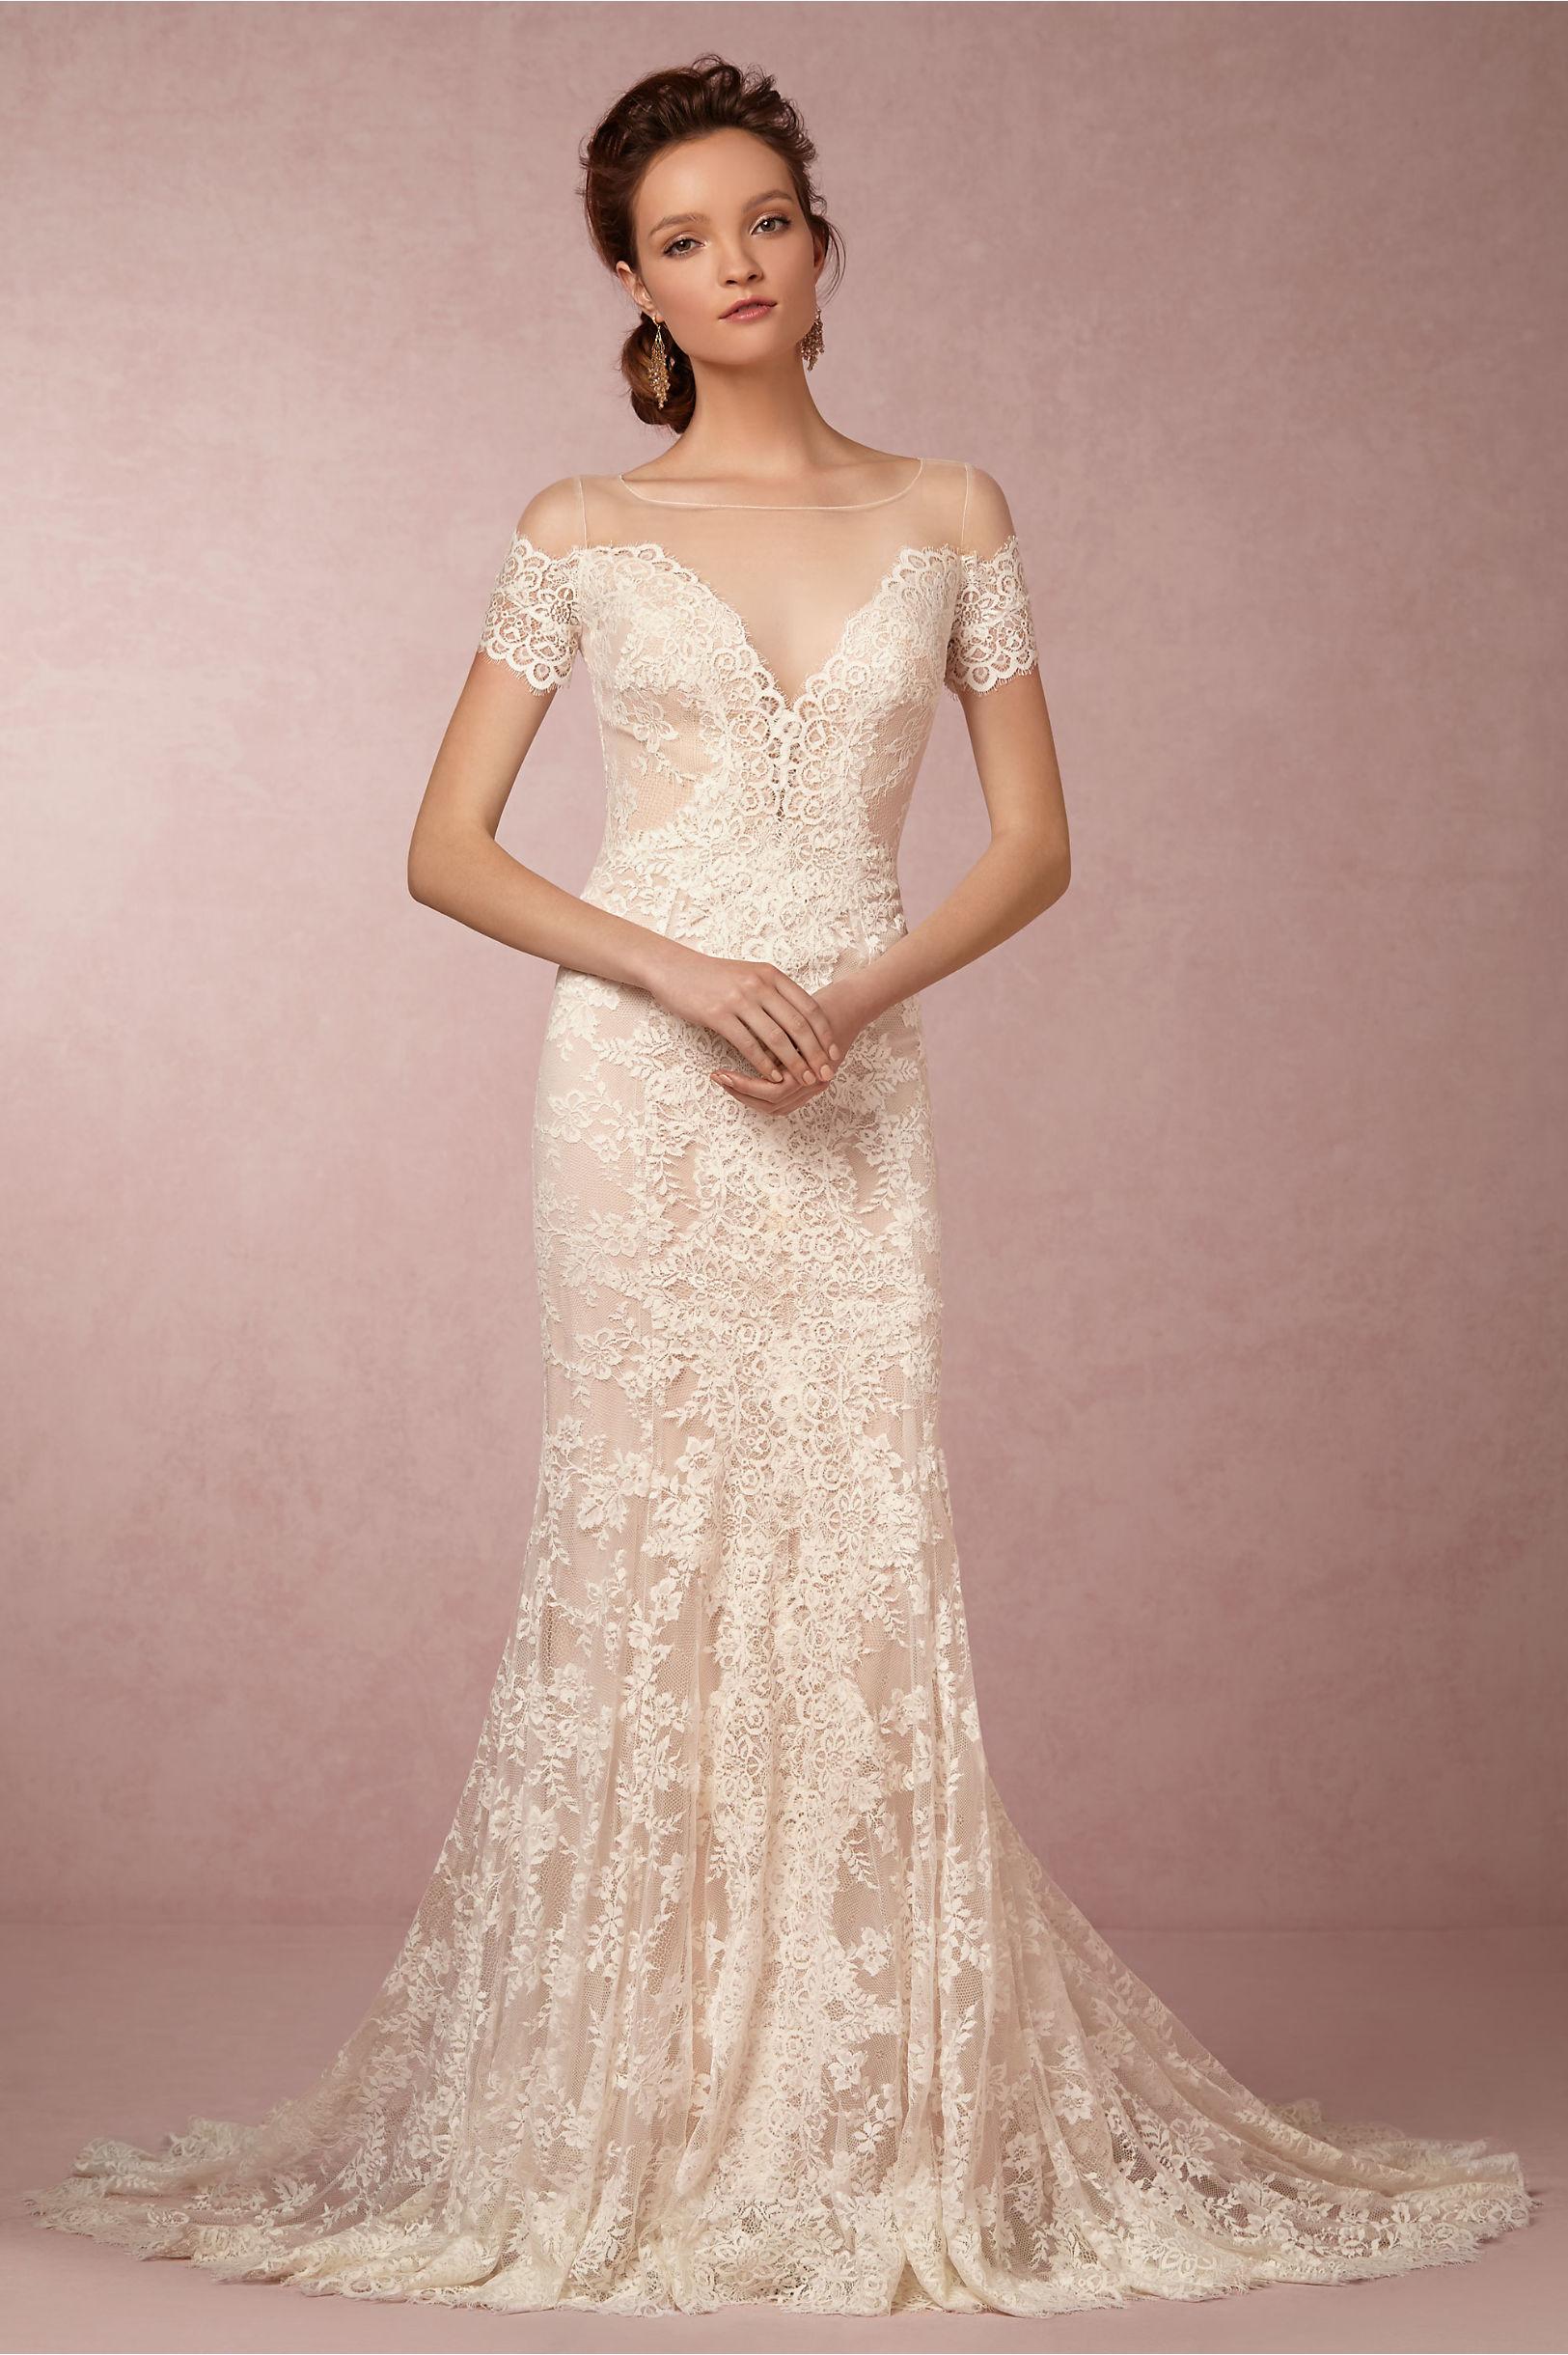 Wedding Dress Watters. Gallery Of Willowby By Watters Inez Low Back ...